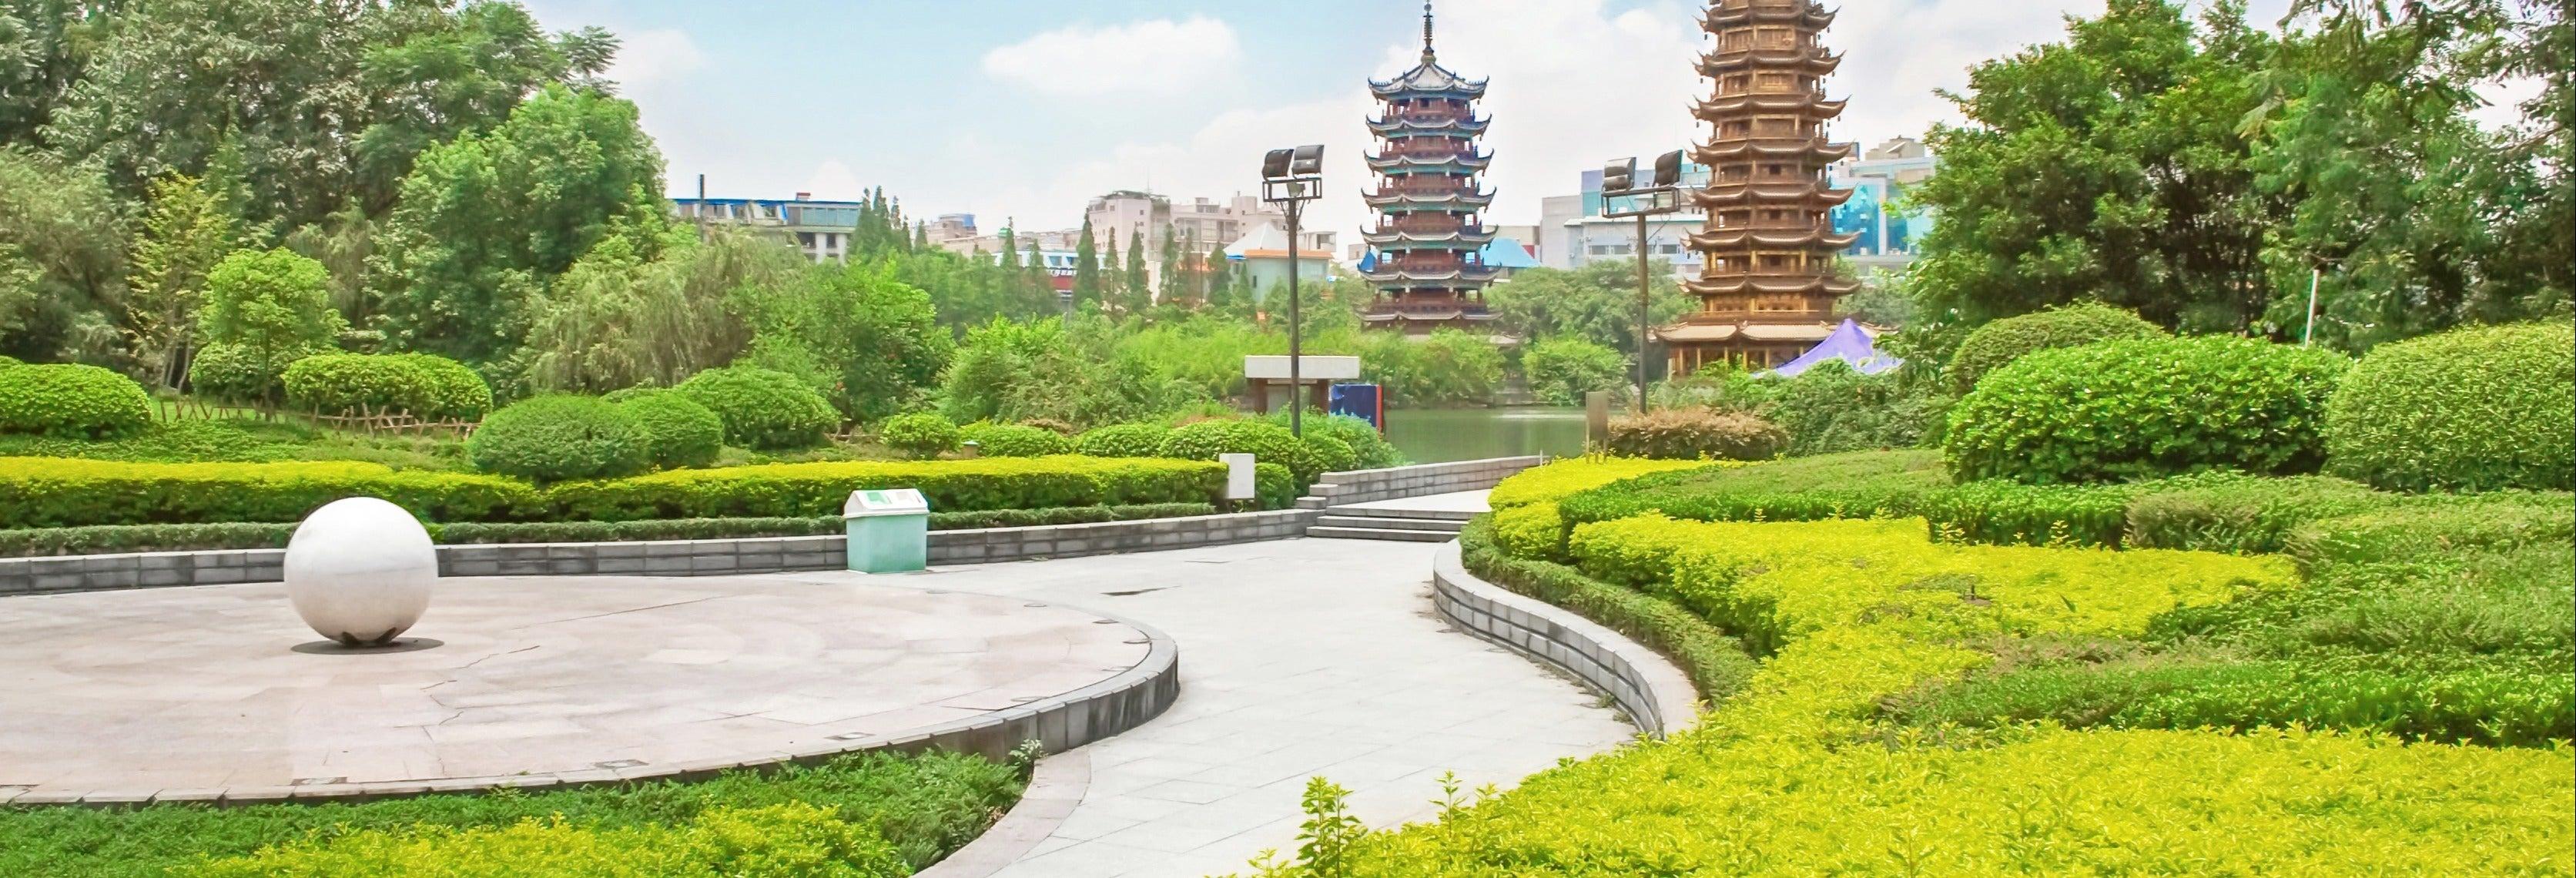 Visita guiada por Guilin